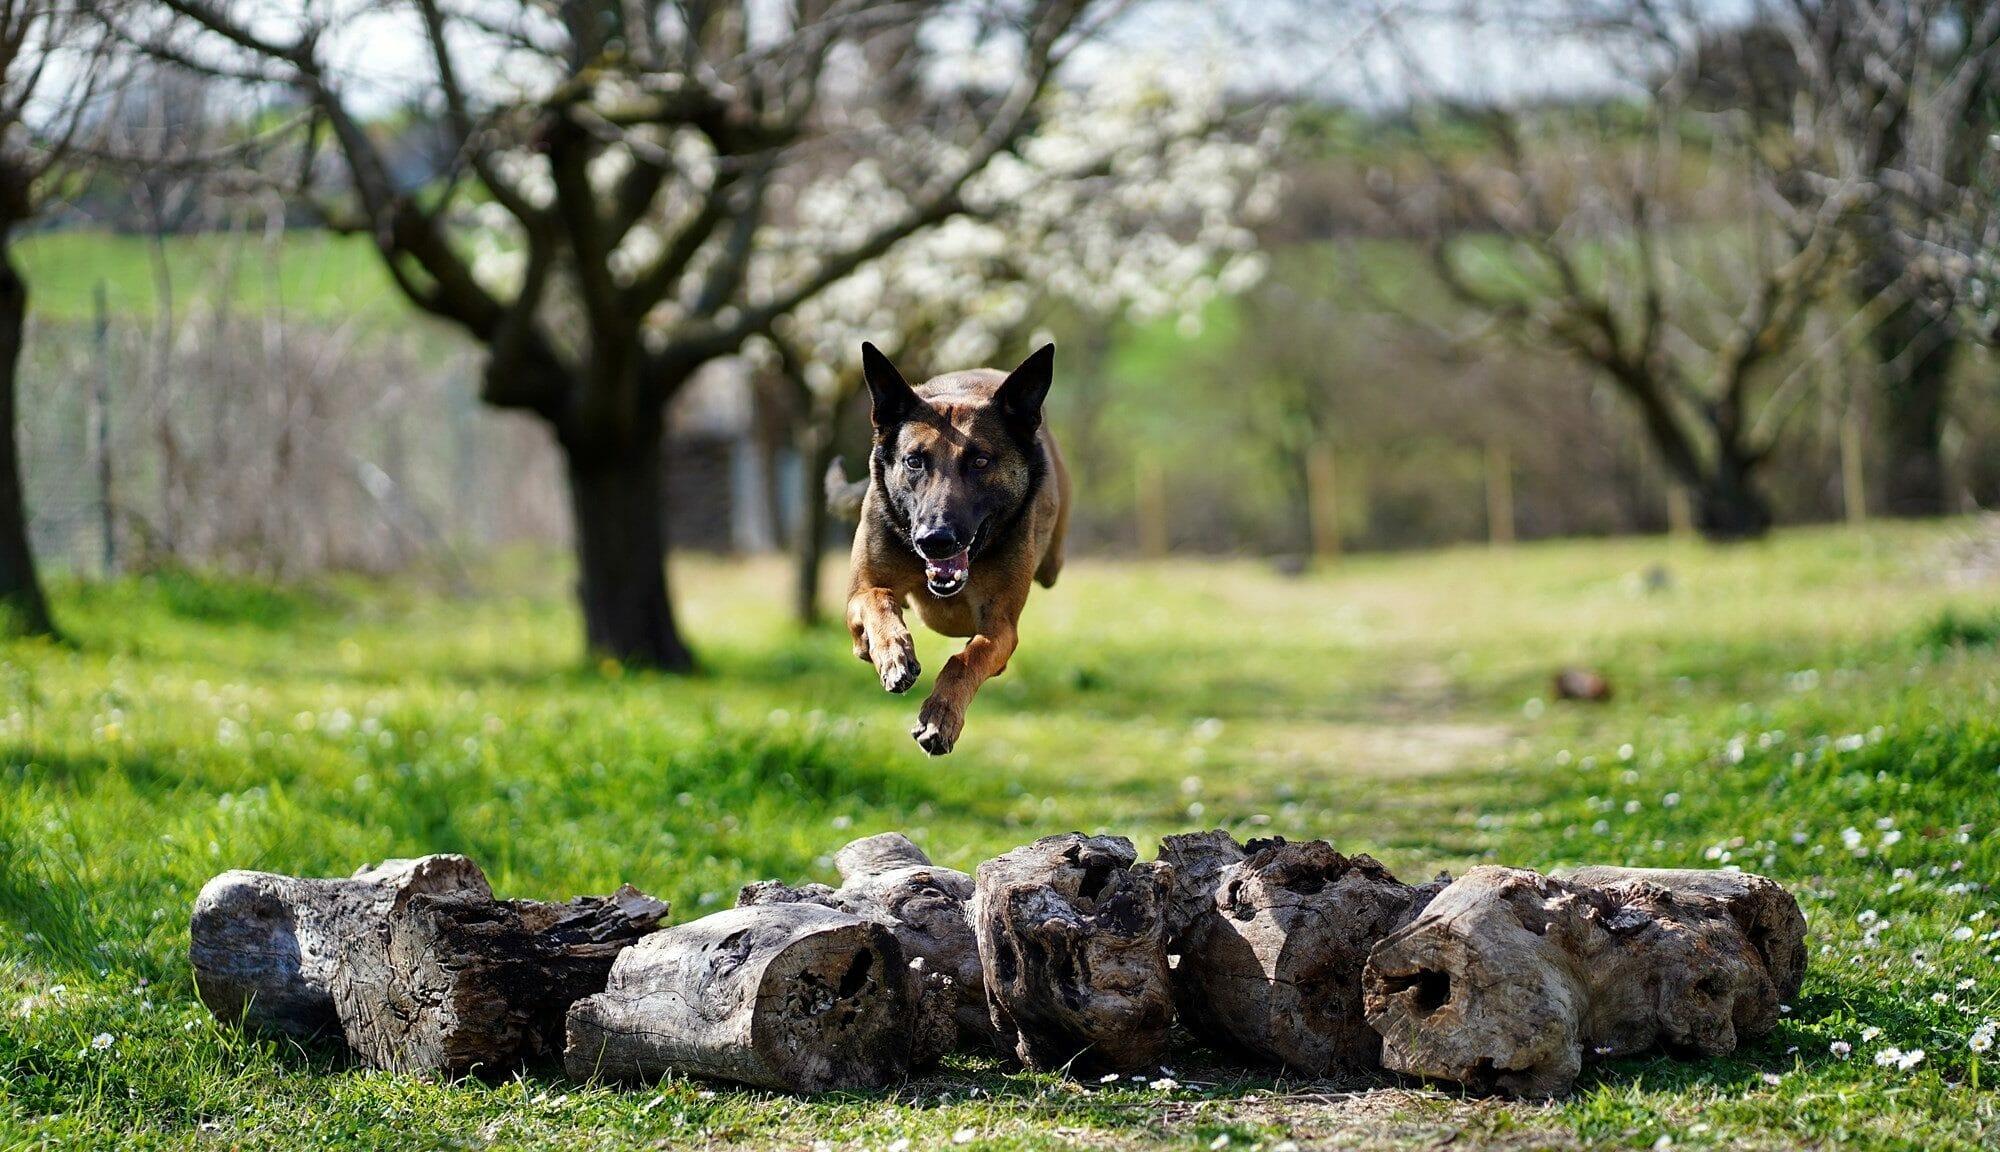 Addestramento cani - addestramento obbedienza